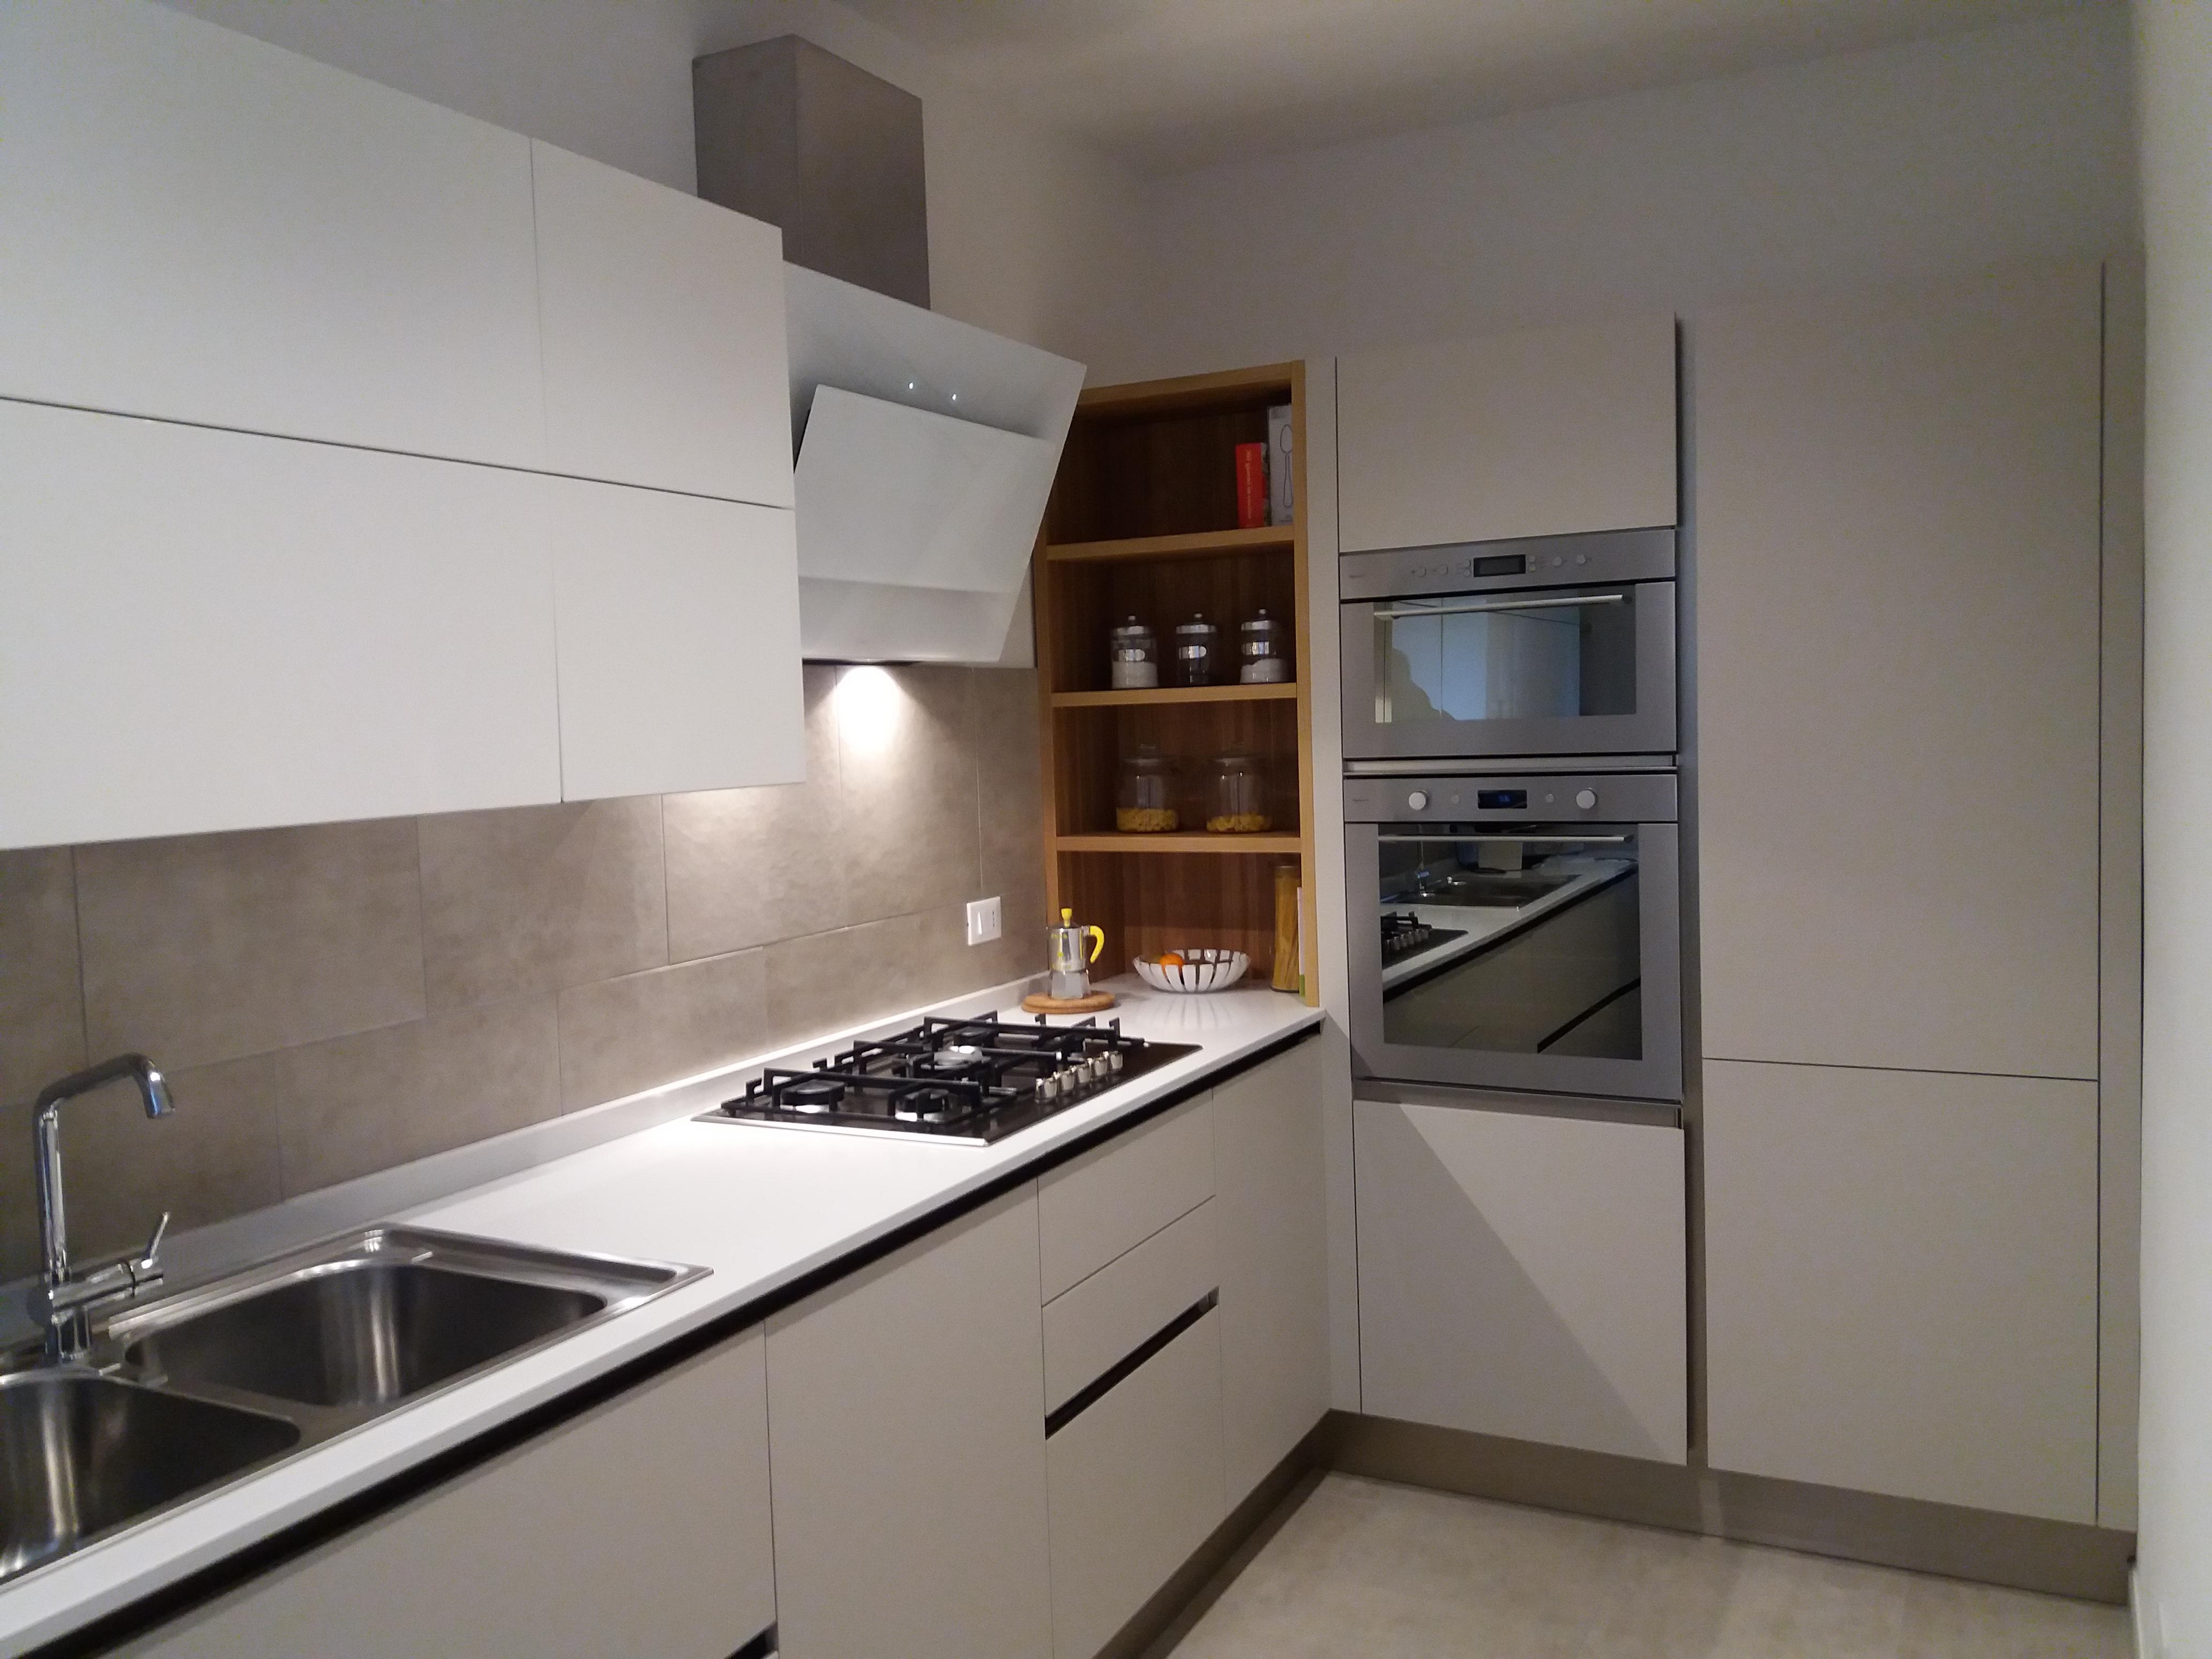 Veneta Cucine Catalogo 2019.Arredamento Padova Arredo Casa Padova Minelle Arredamenti